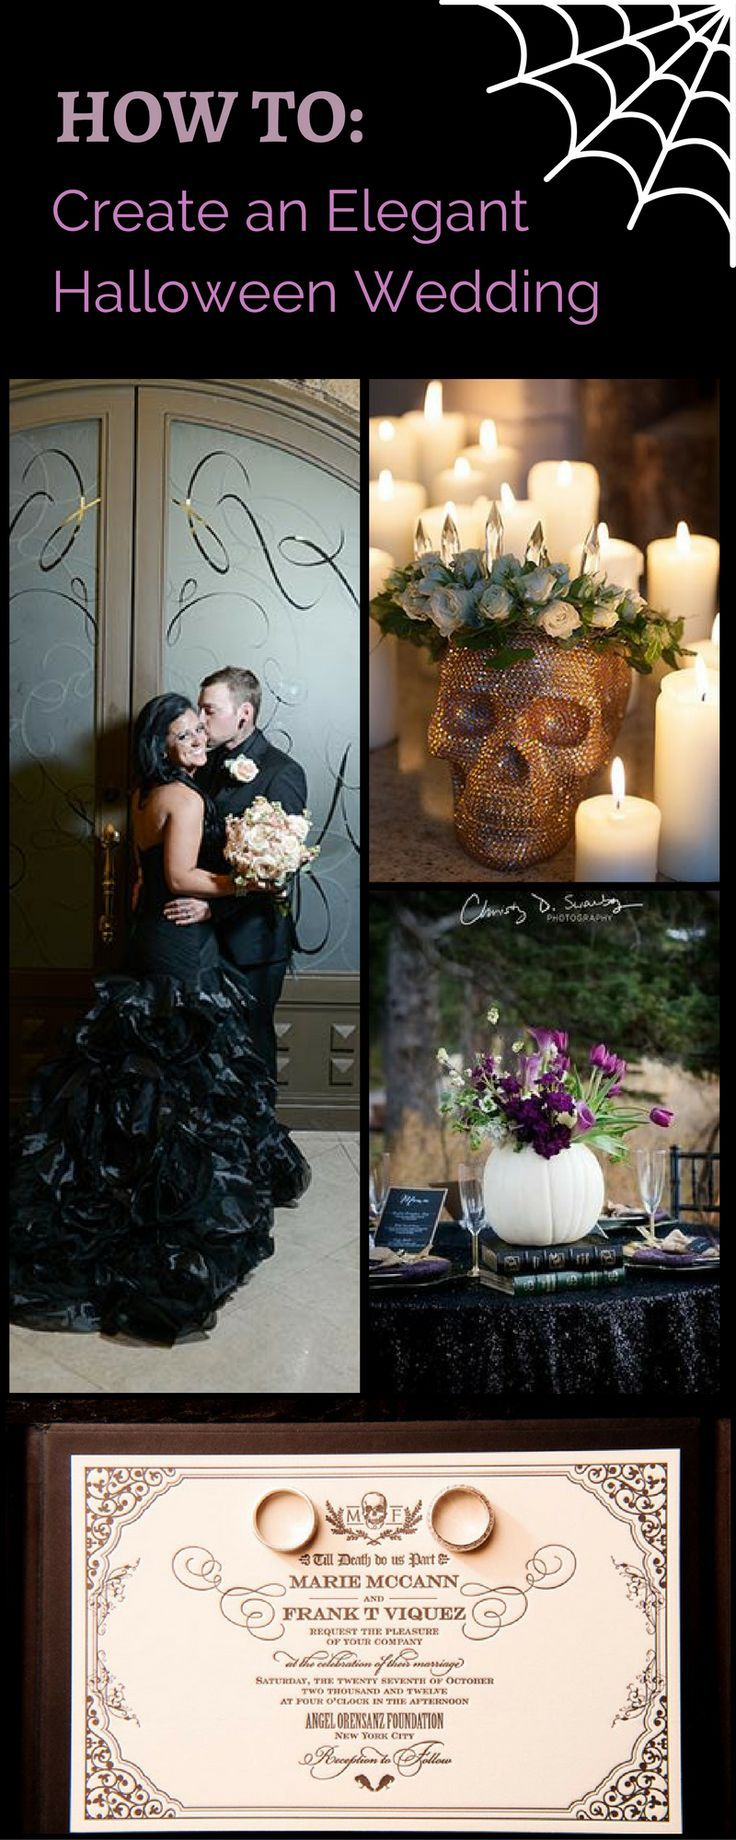 Diy halloween wedding decorations  Classy Halloween Wedding Ideas  Sabrina   Pinterest  Gothic